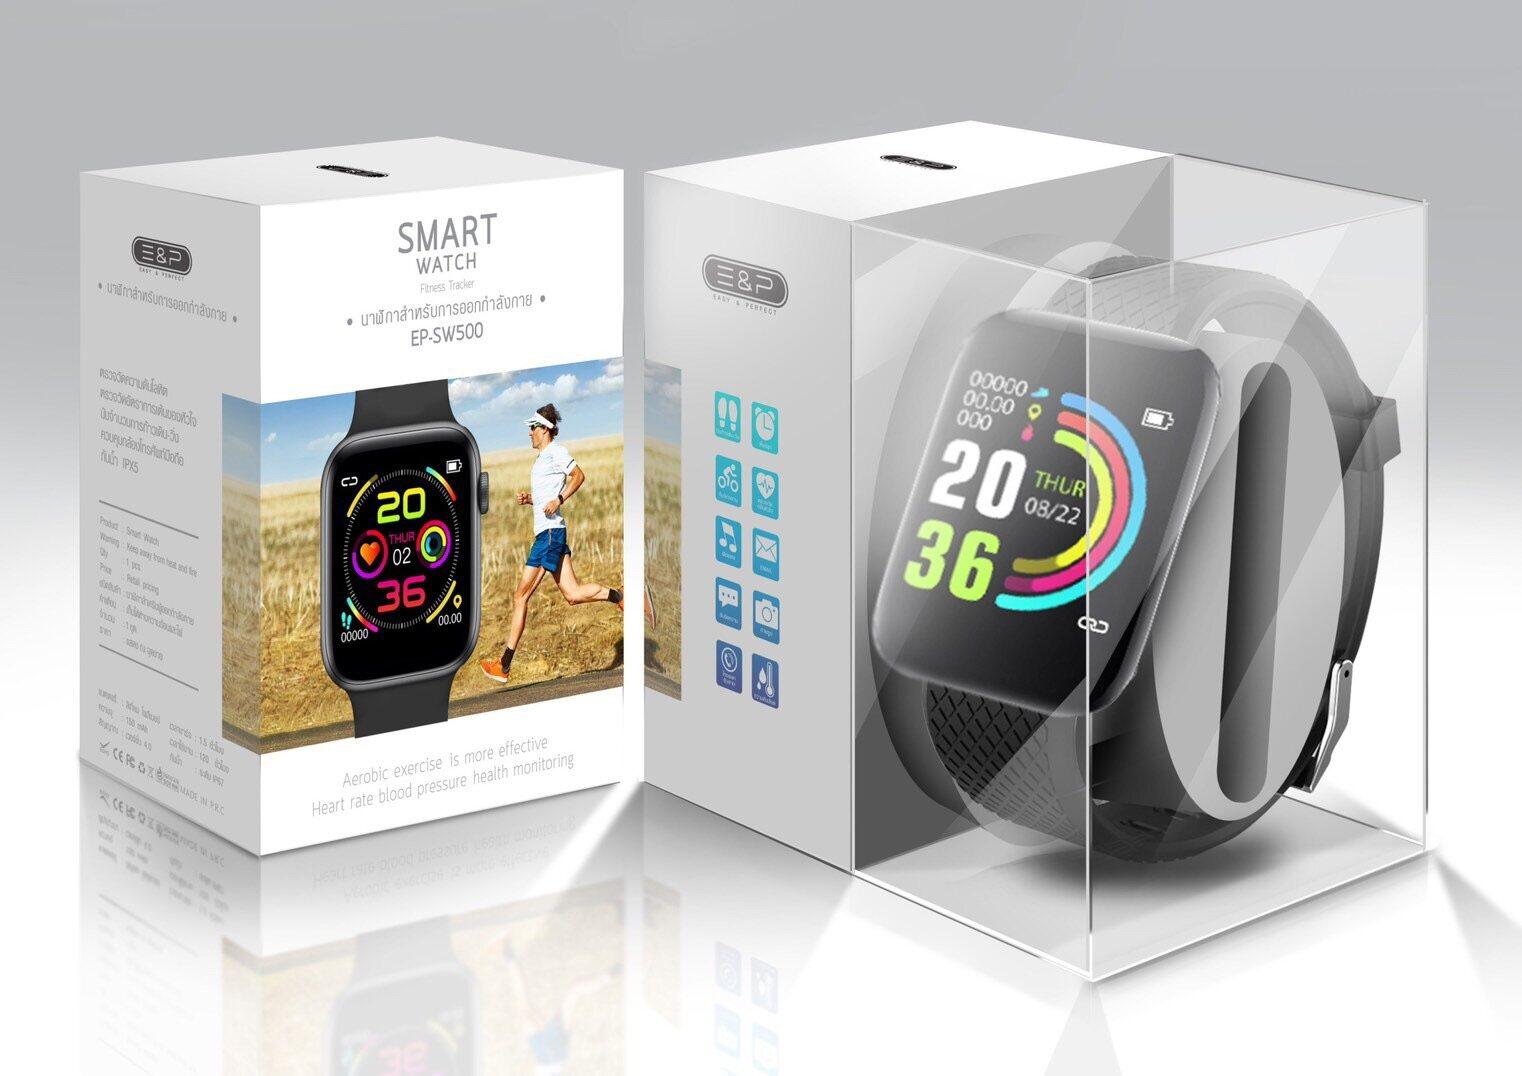 images?q=tbn:ANd9GcQh_l3eQ5xwiPy07kGEXjmjgmBKBRB7H2mRxCGhv1tFWg5c_mWT Smart Watch Ep-s03